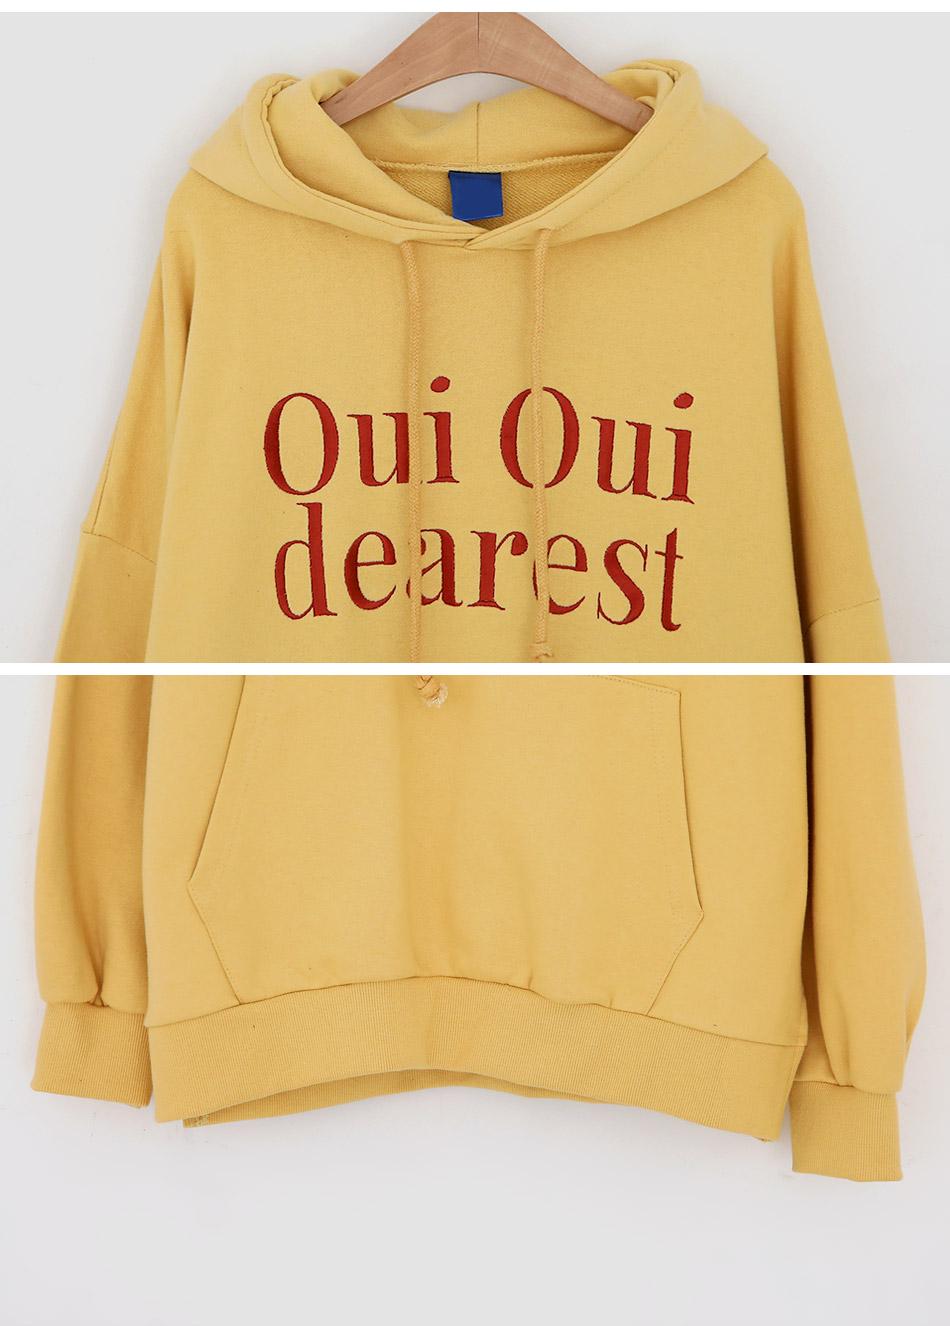 Dearrest Hooded T-Shirt